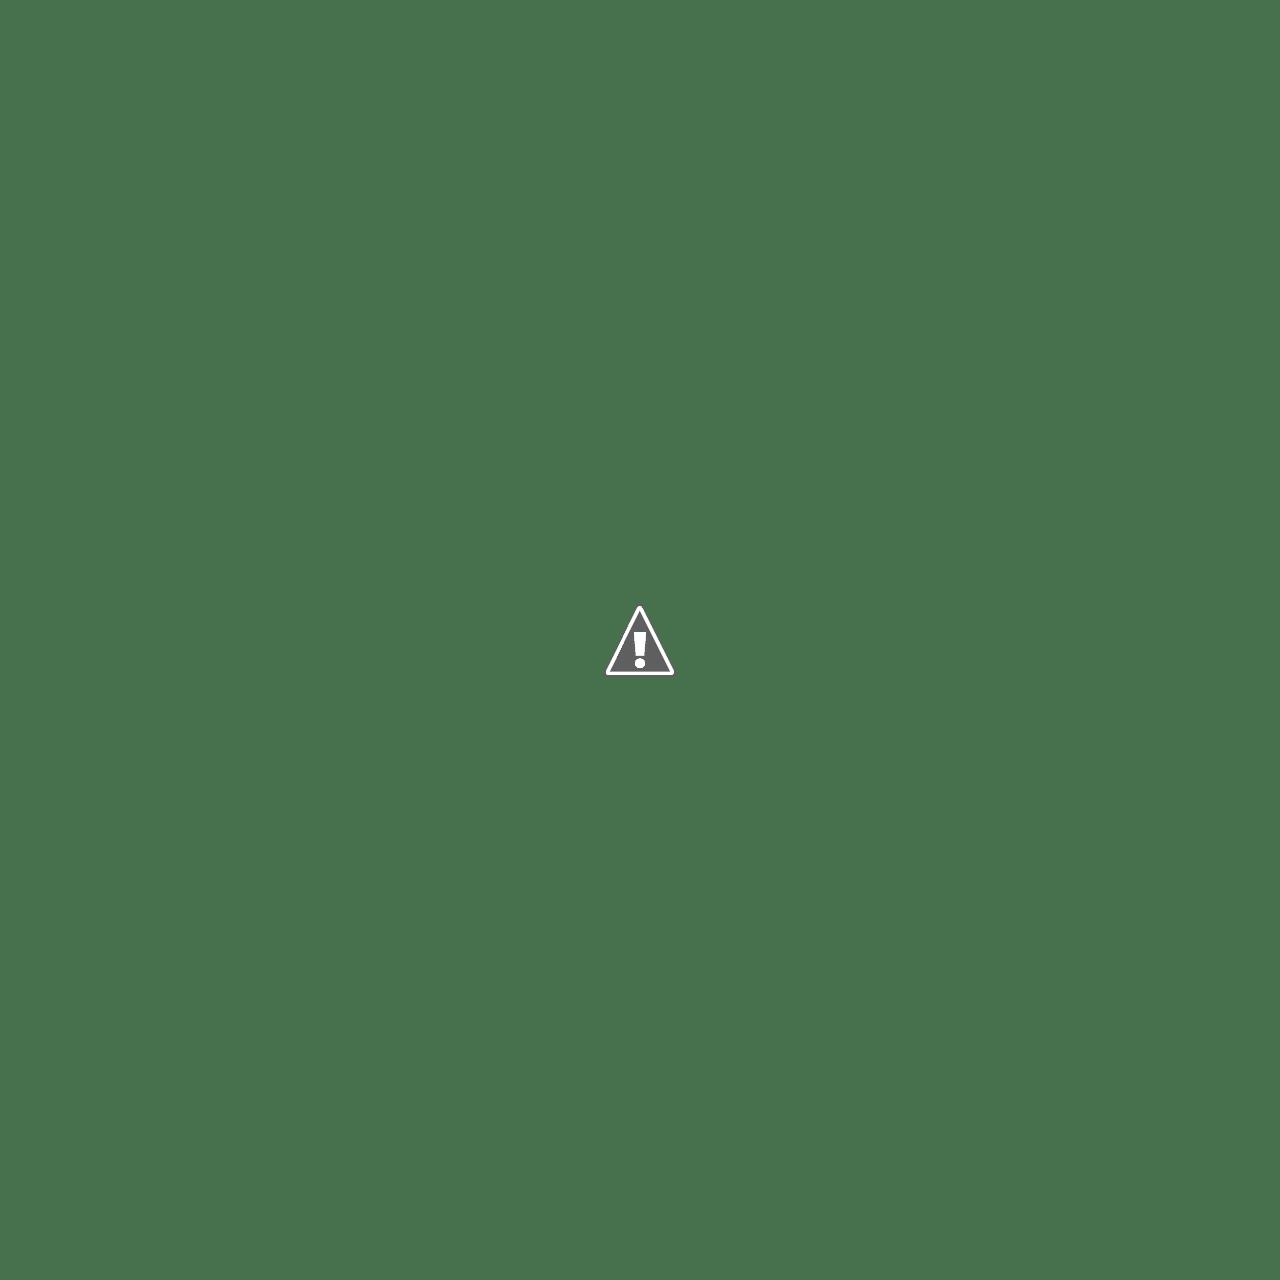 6 Month Seo Plan